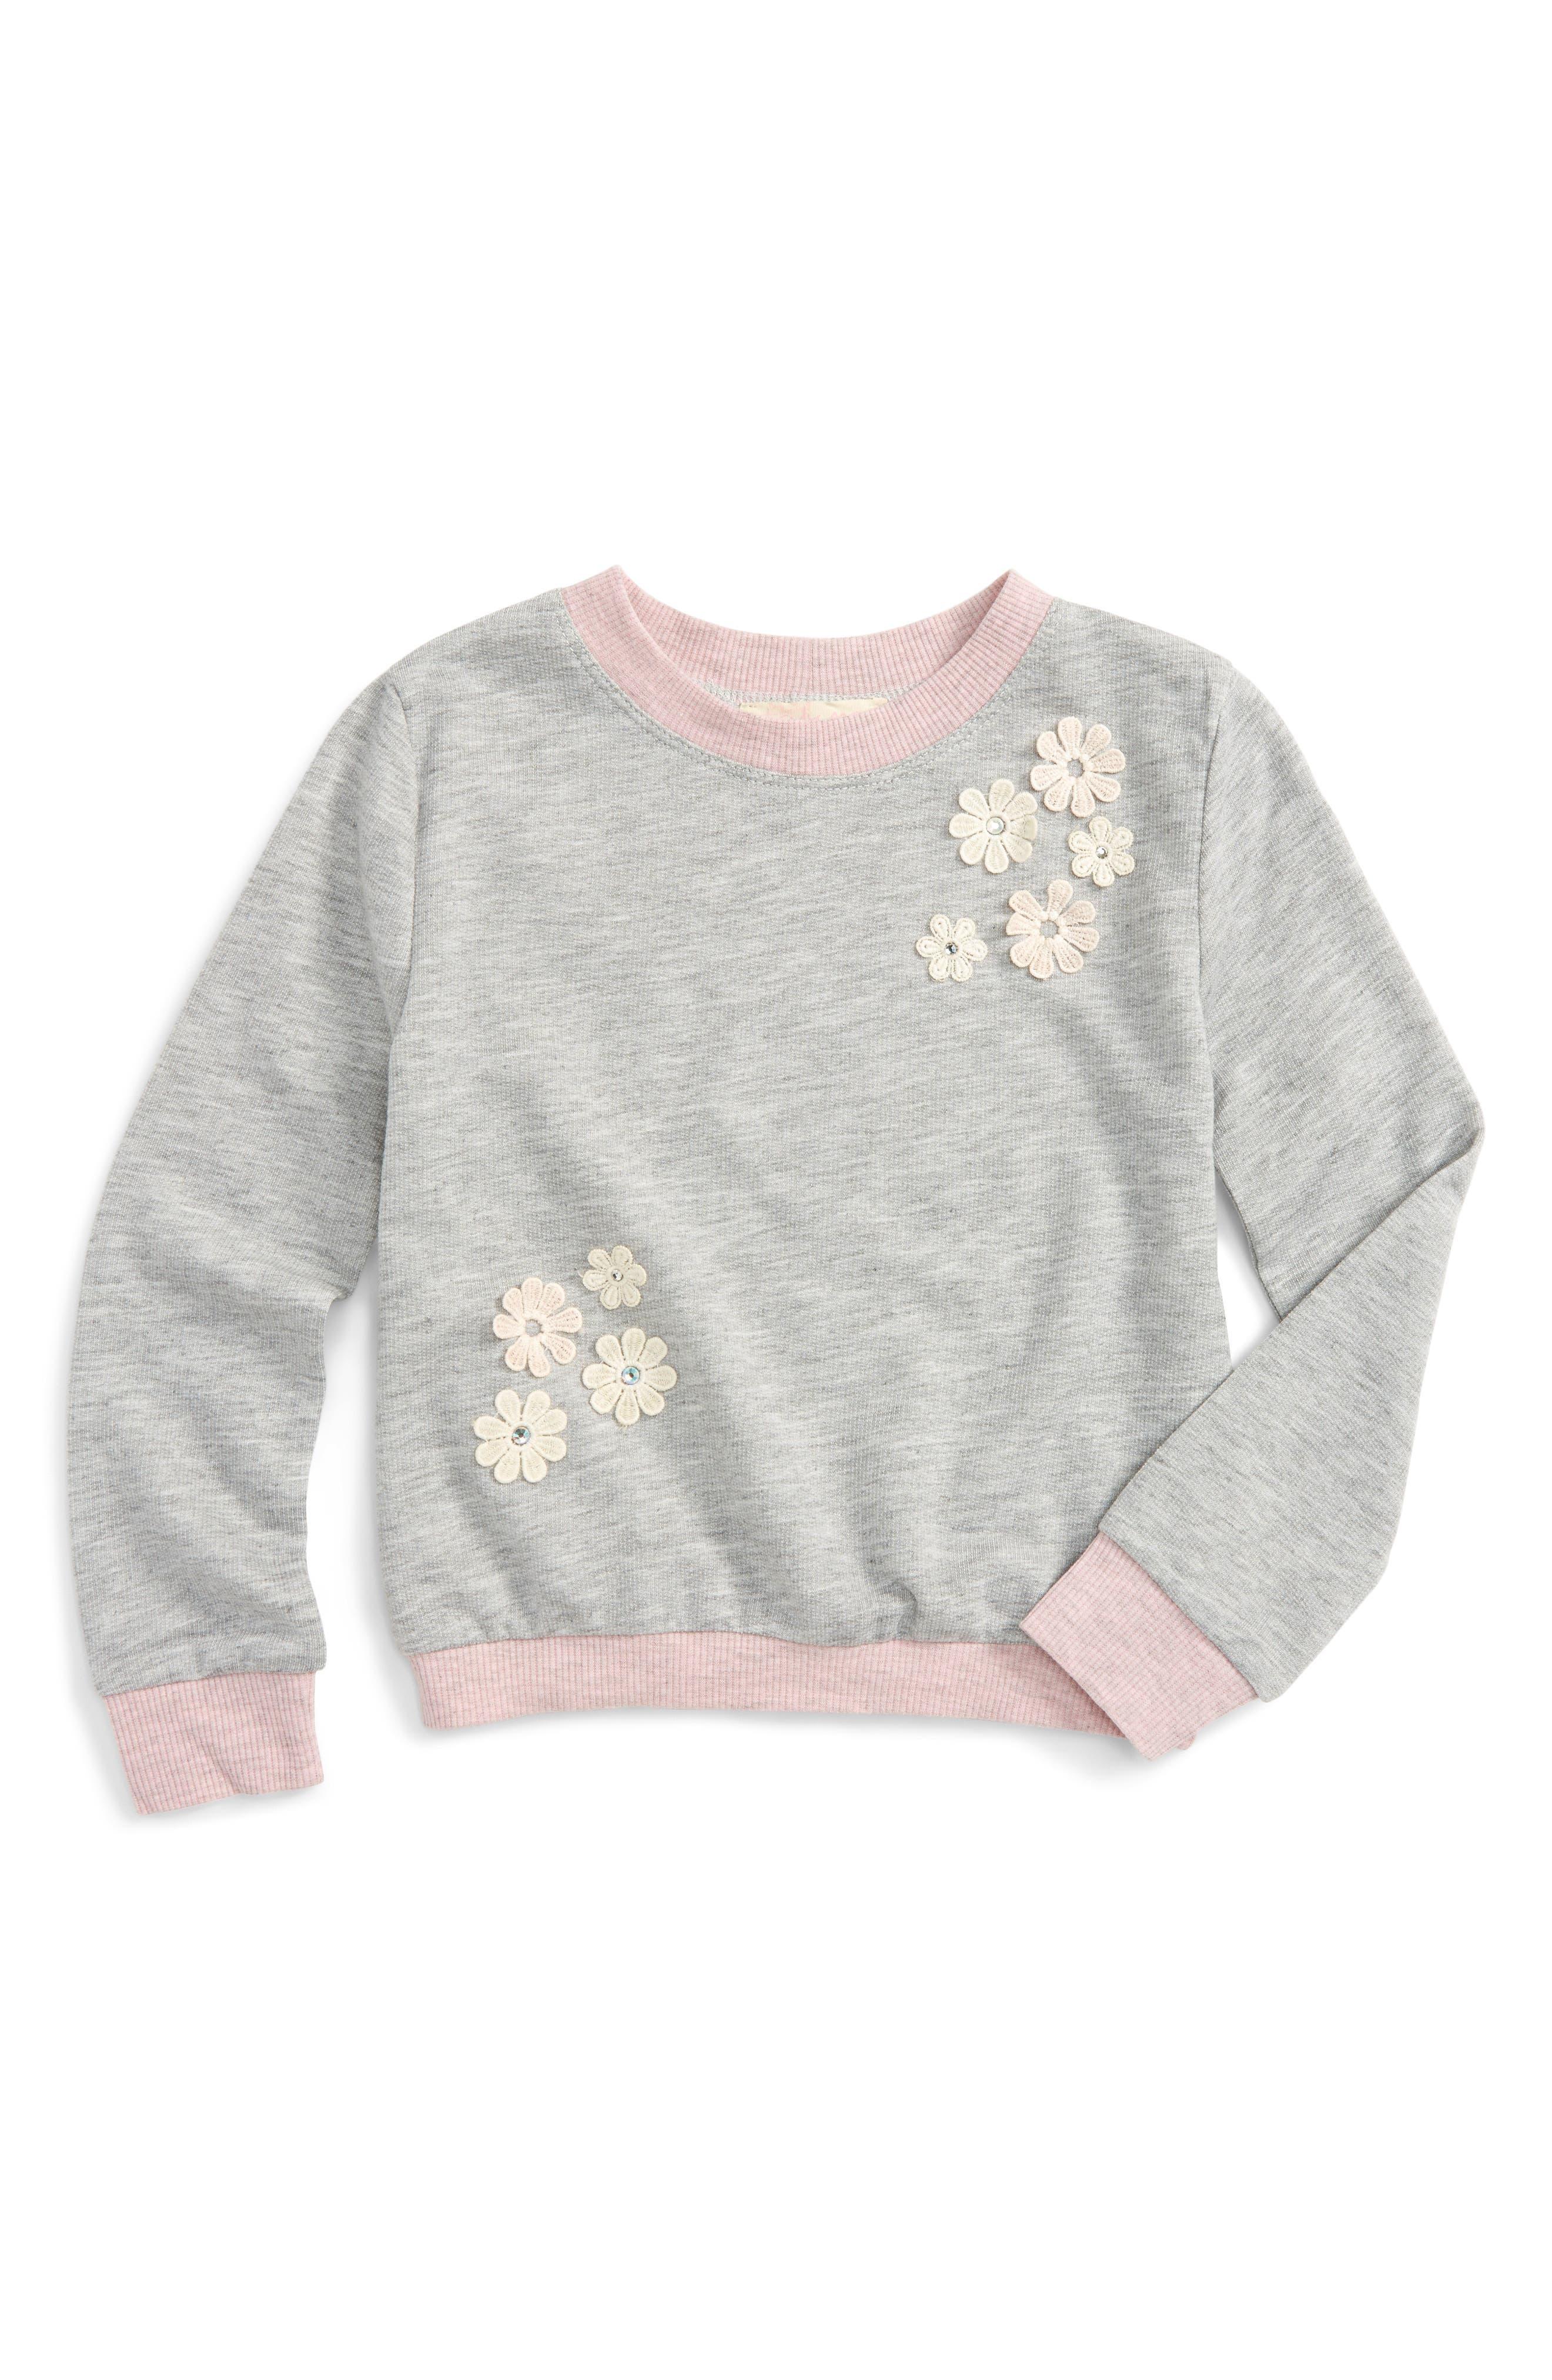 Floral Appliqué Sweatshirt,                         Main,                         color, 026